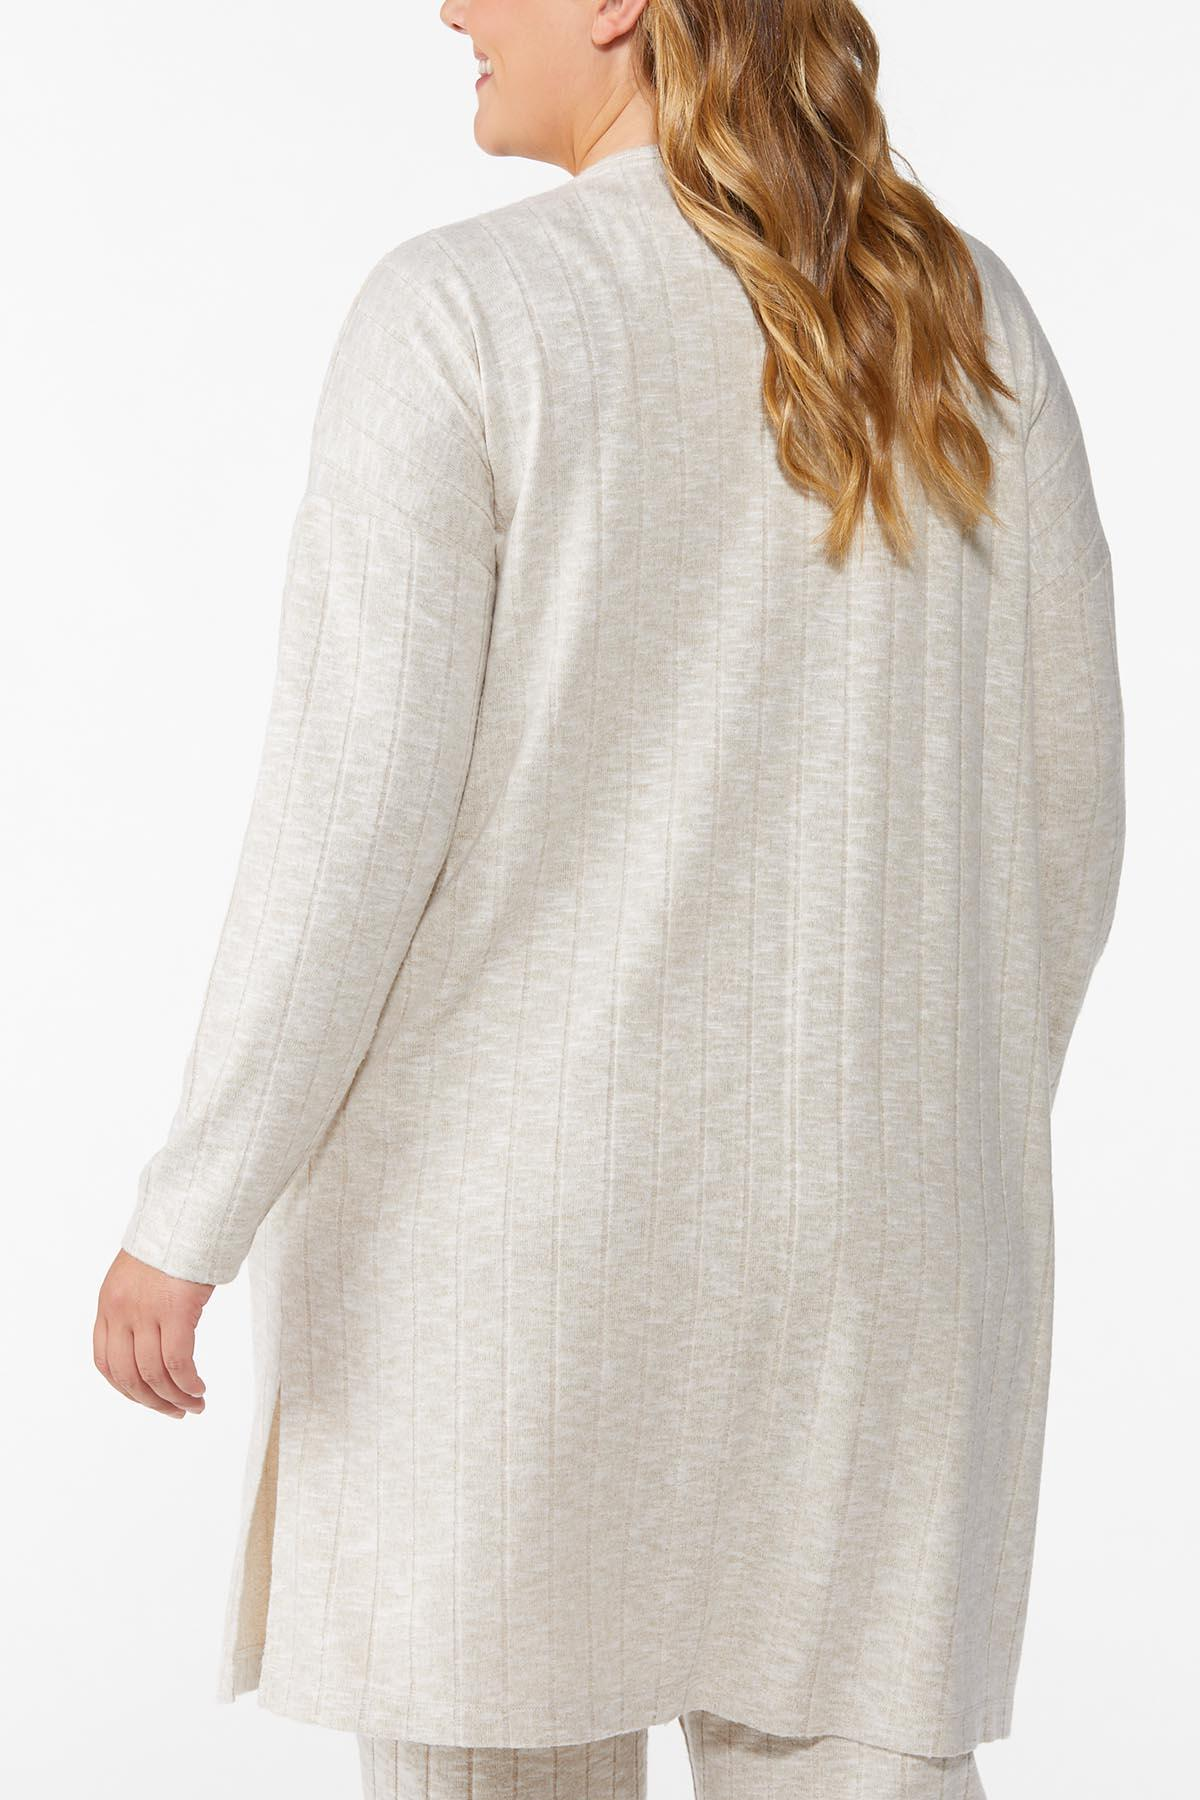 Plus Size Cozy Ribbed Cardigan (Item #44796318)